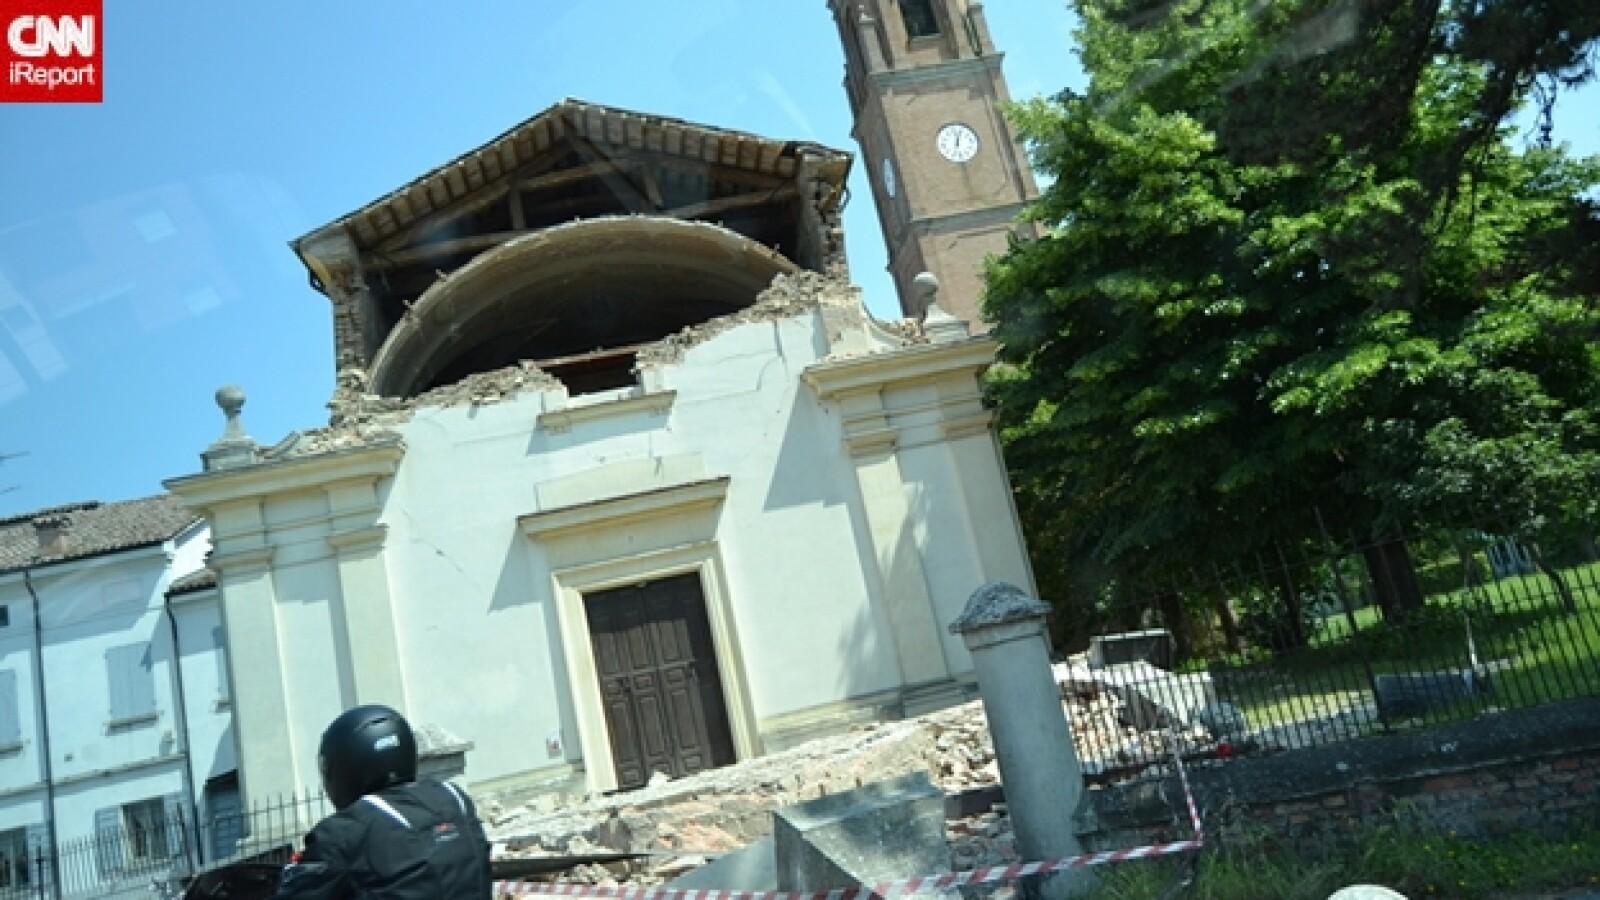 irpt-temblor-italia4